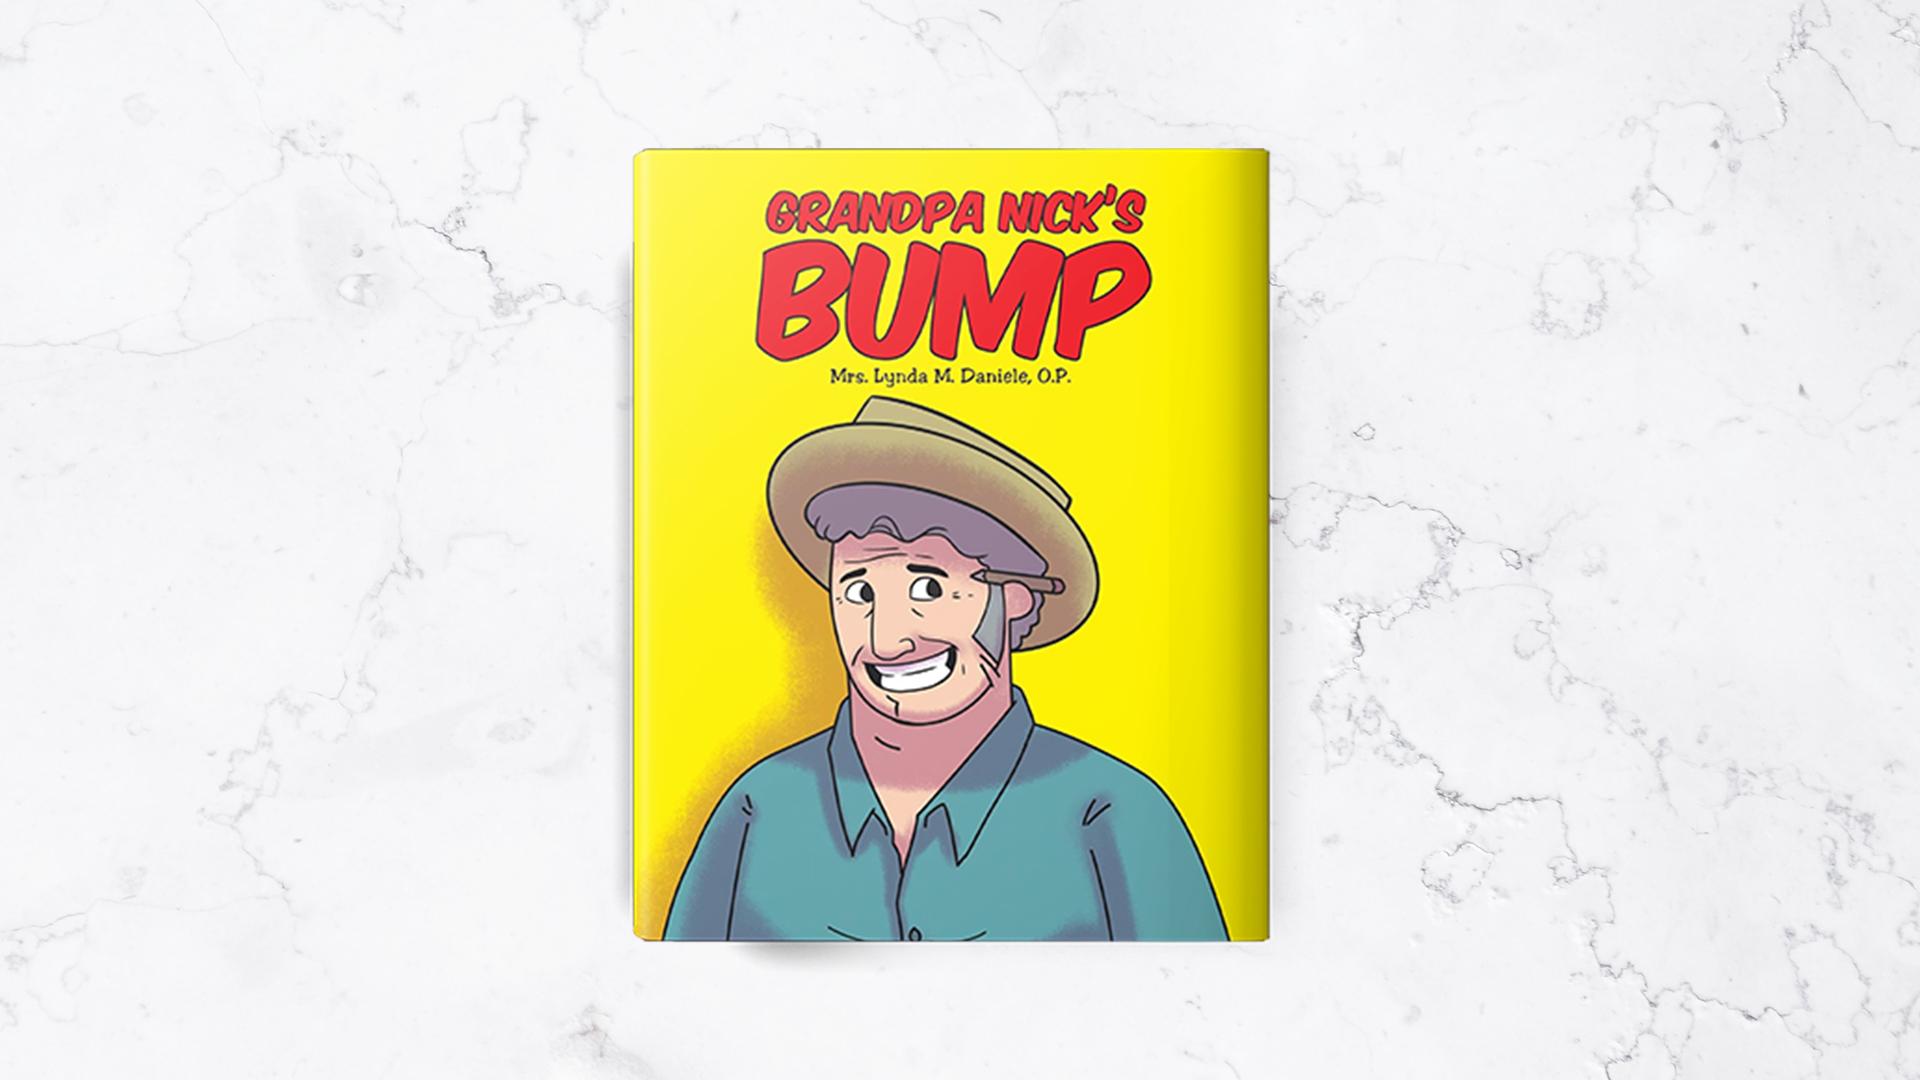 Grandpa Nick's Bump by Lynda Damiele banner